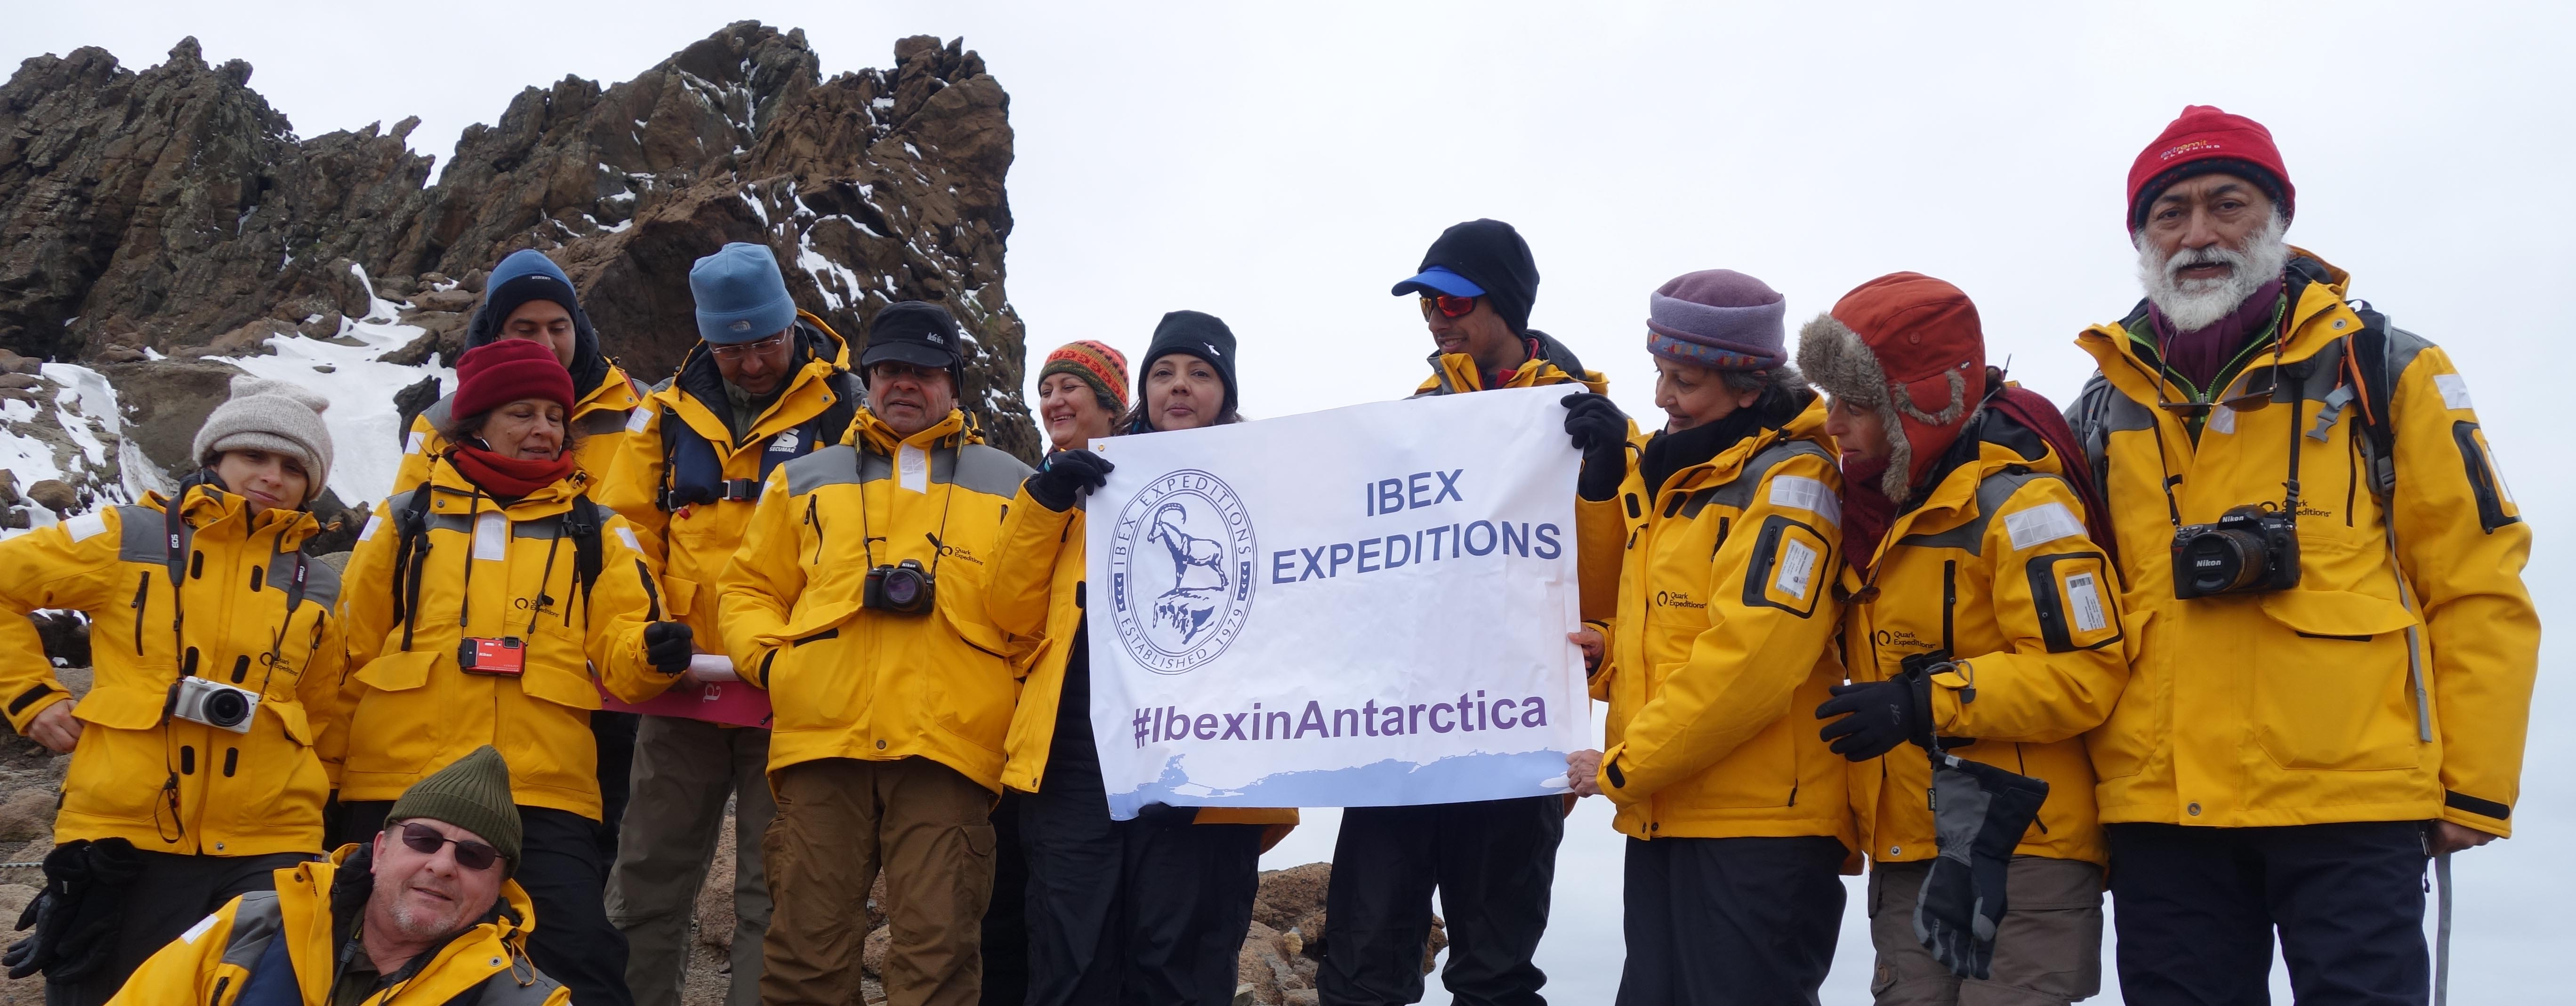 Ibex Expeditions In Antarctica